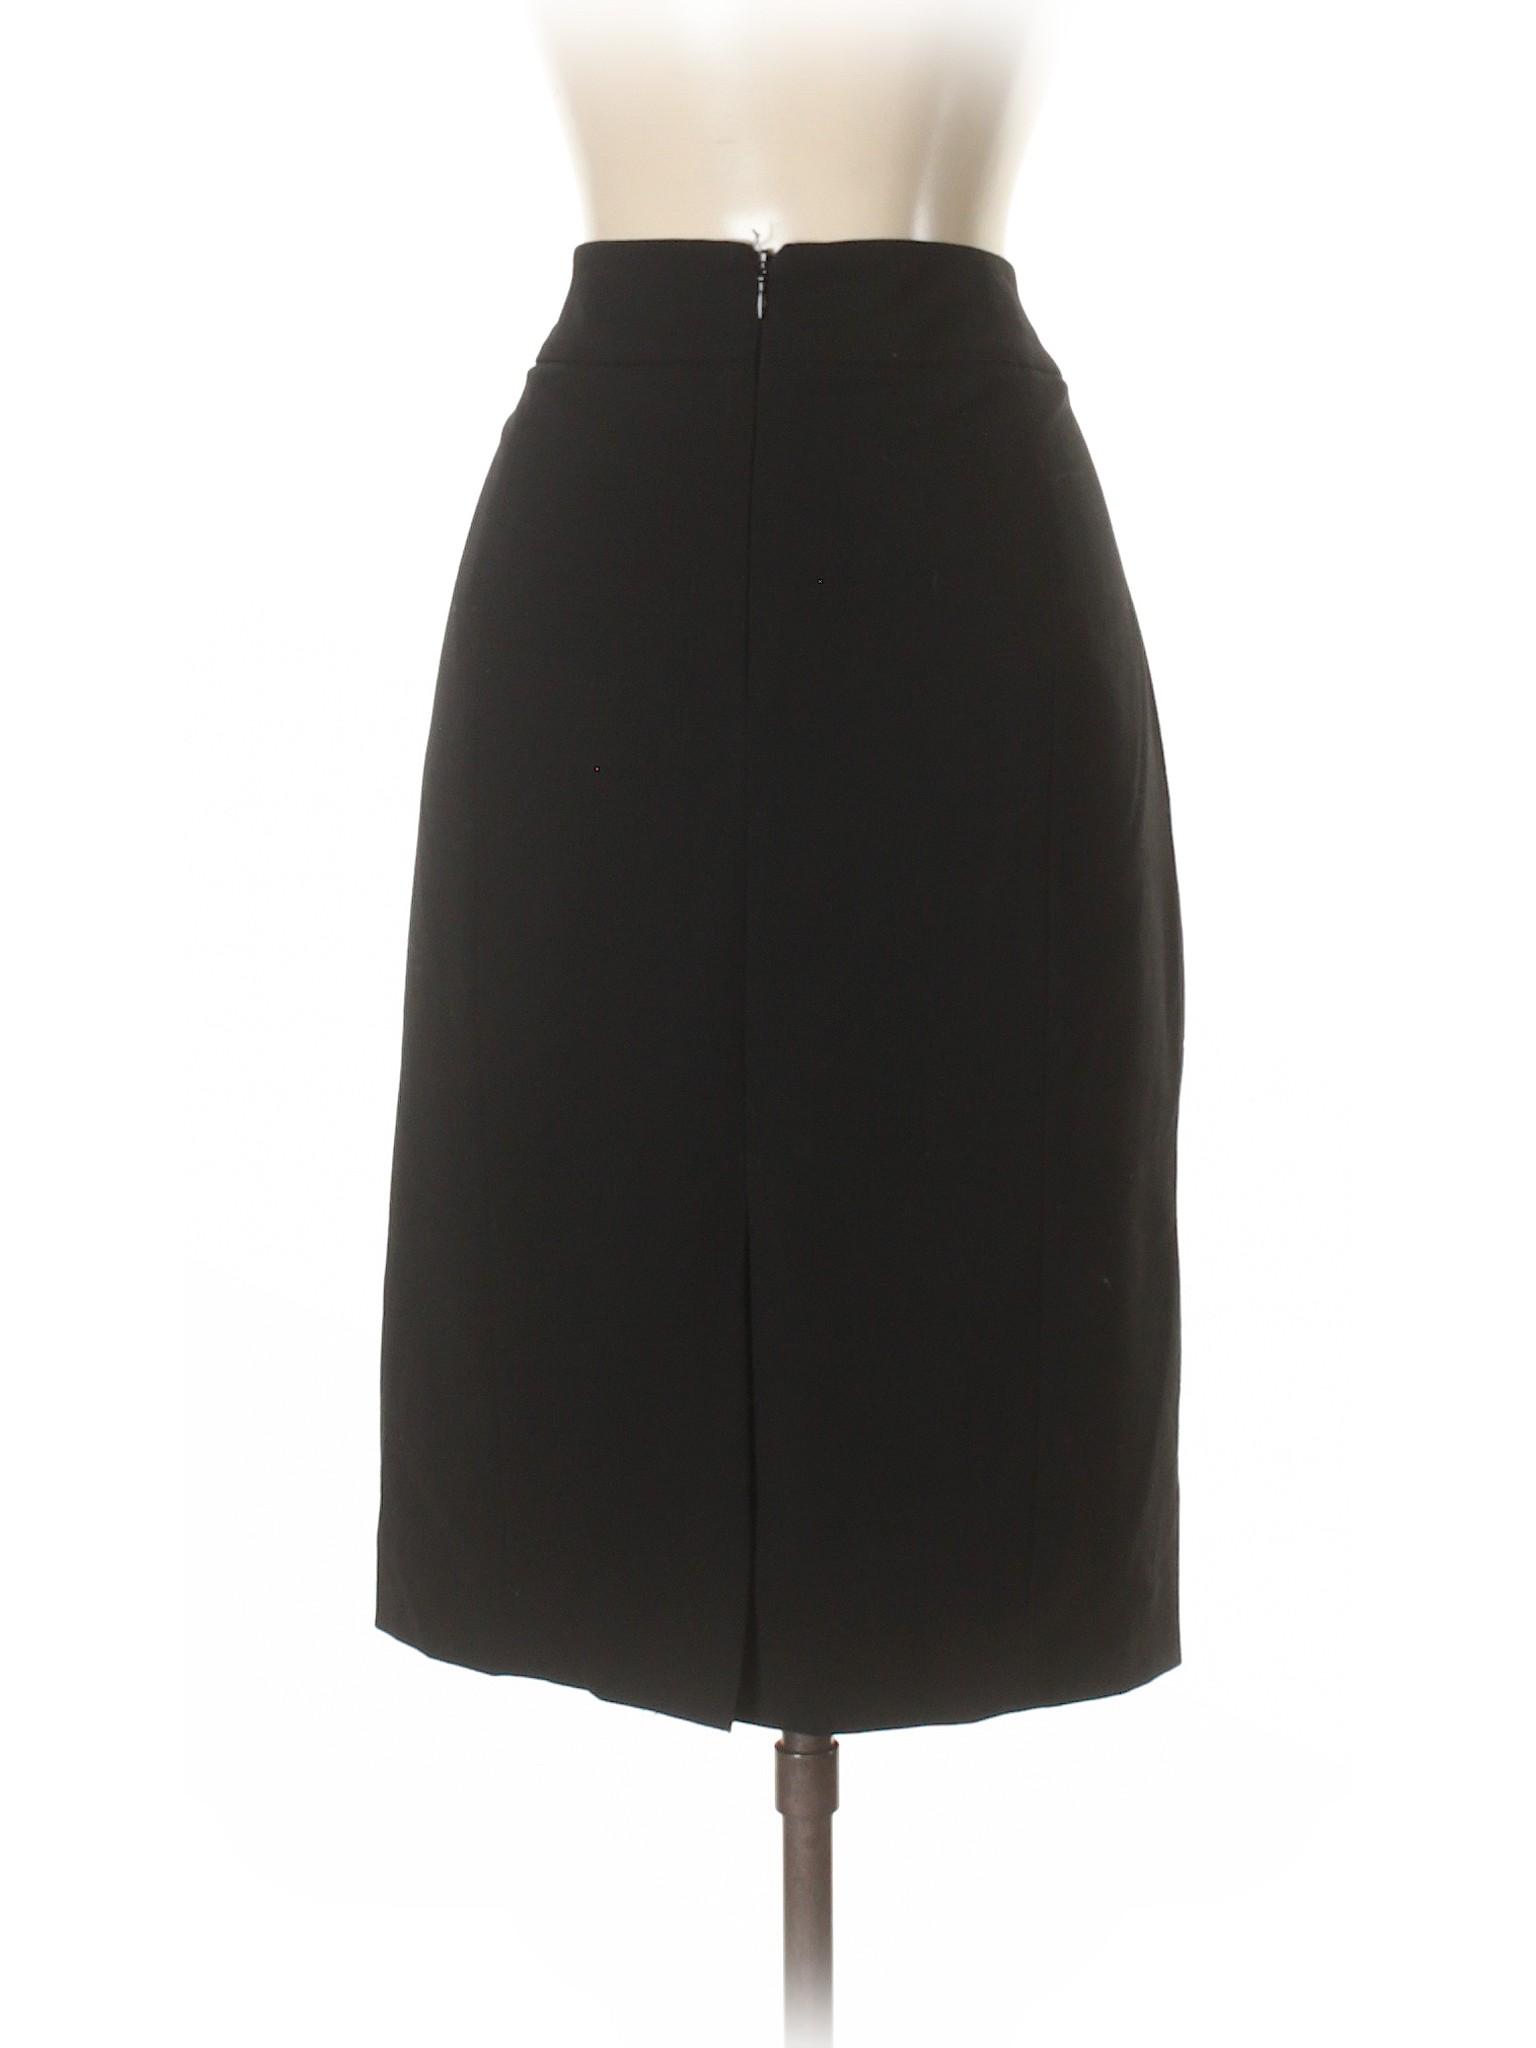 Boutique Skirt Boutique Skirt Casual Skirt Boutique Casual Casual qOaUtn